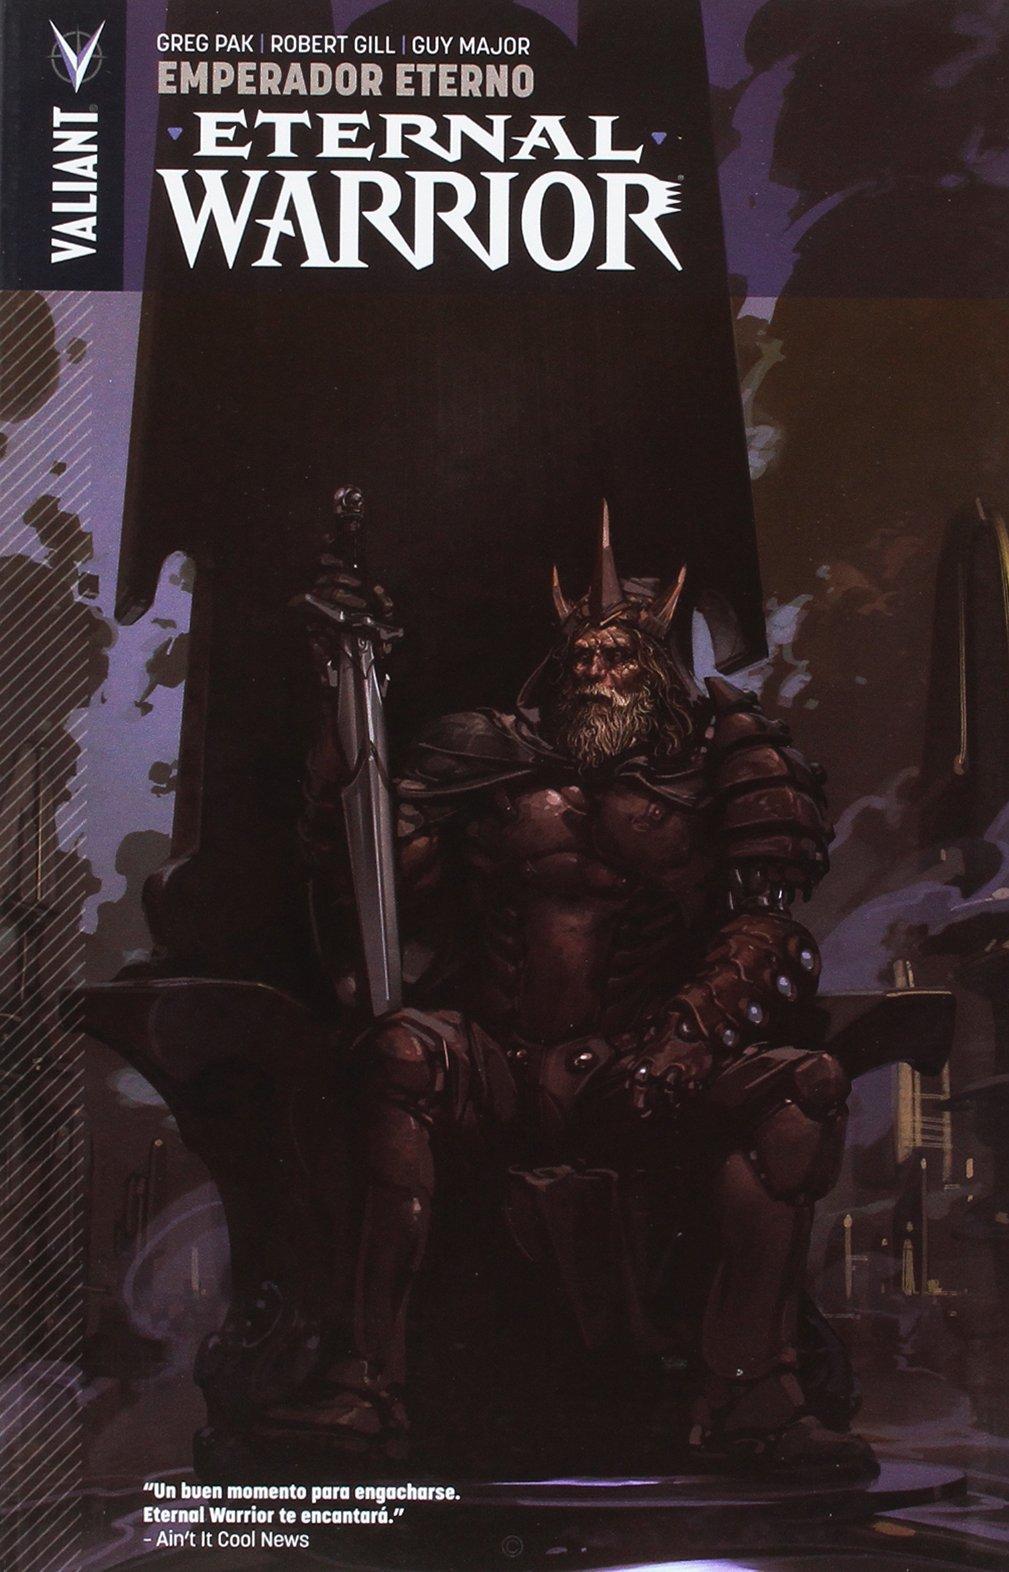 Pack Valiant 06. Eternal warrior y Rai: Amazon.es: Vv.Aa, Vv.Aa: Libros